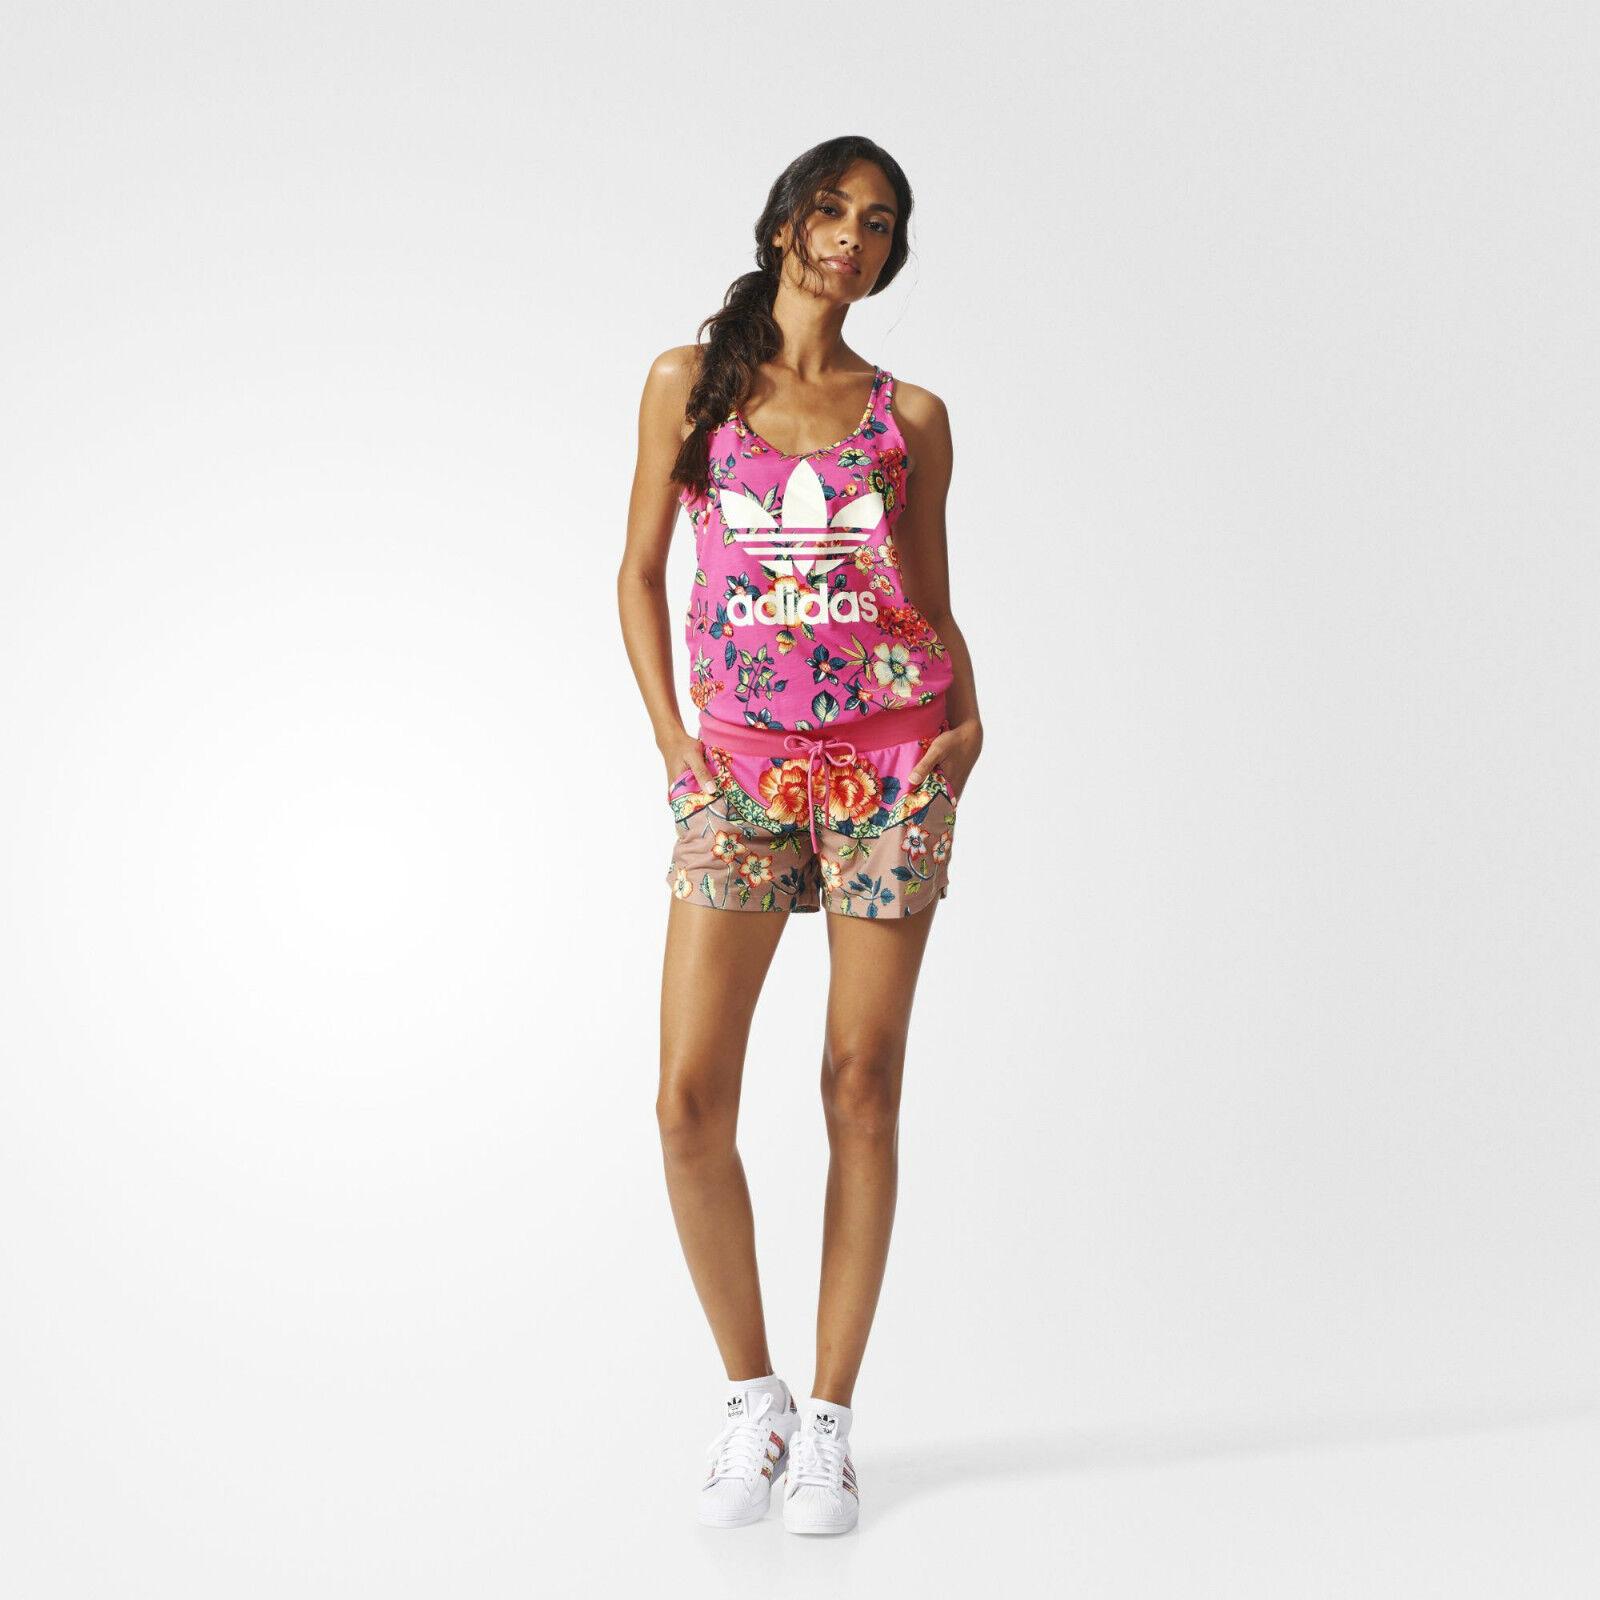 Adidas Originals W Jardineto Pink Jumpsuit Size New  (532)